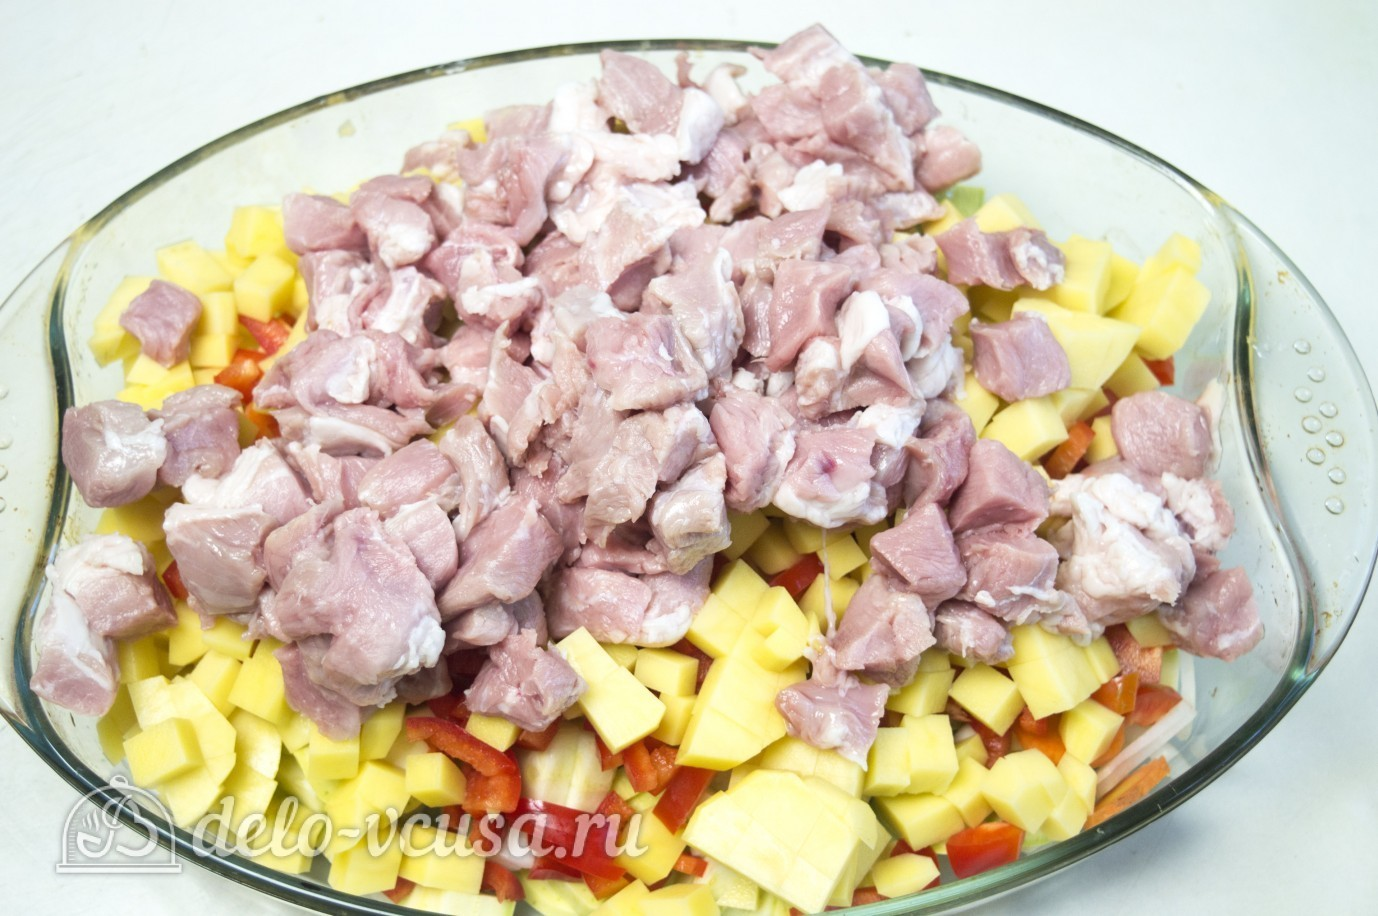 мясо в форме в духовке рецепт с фото